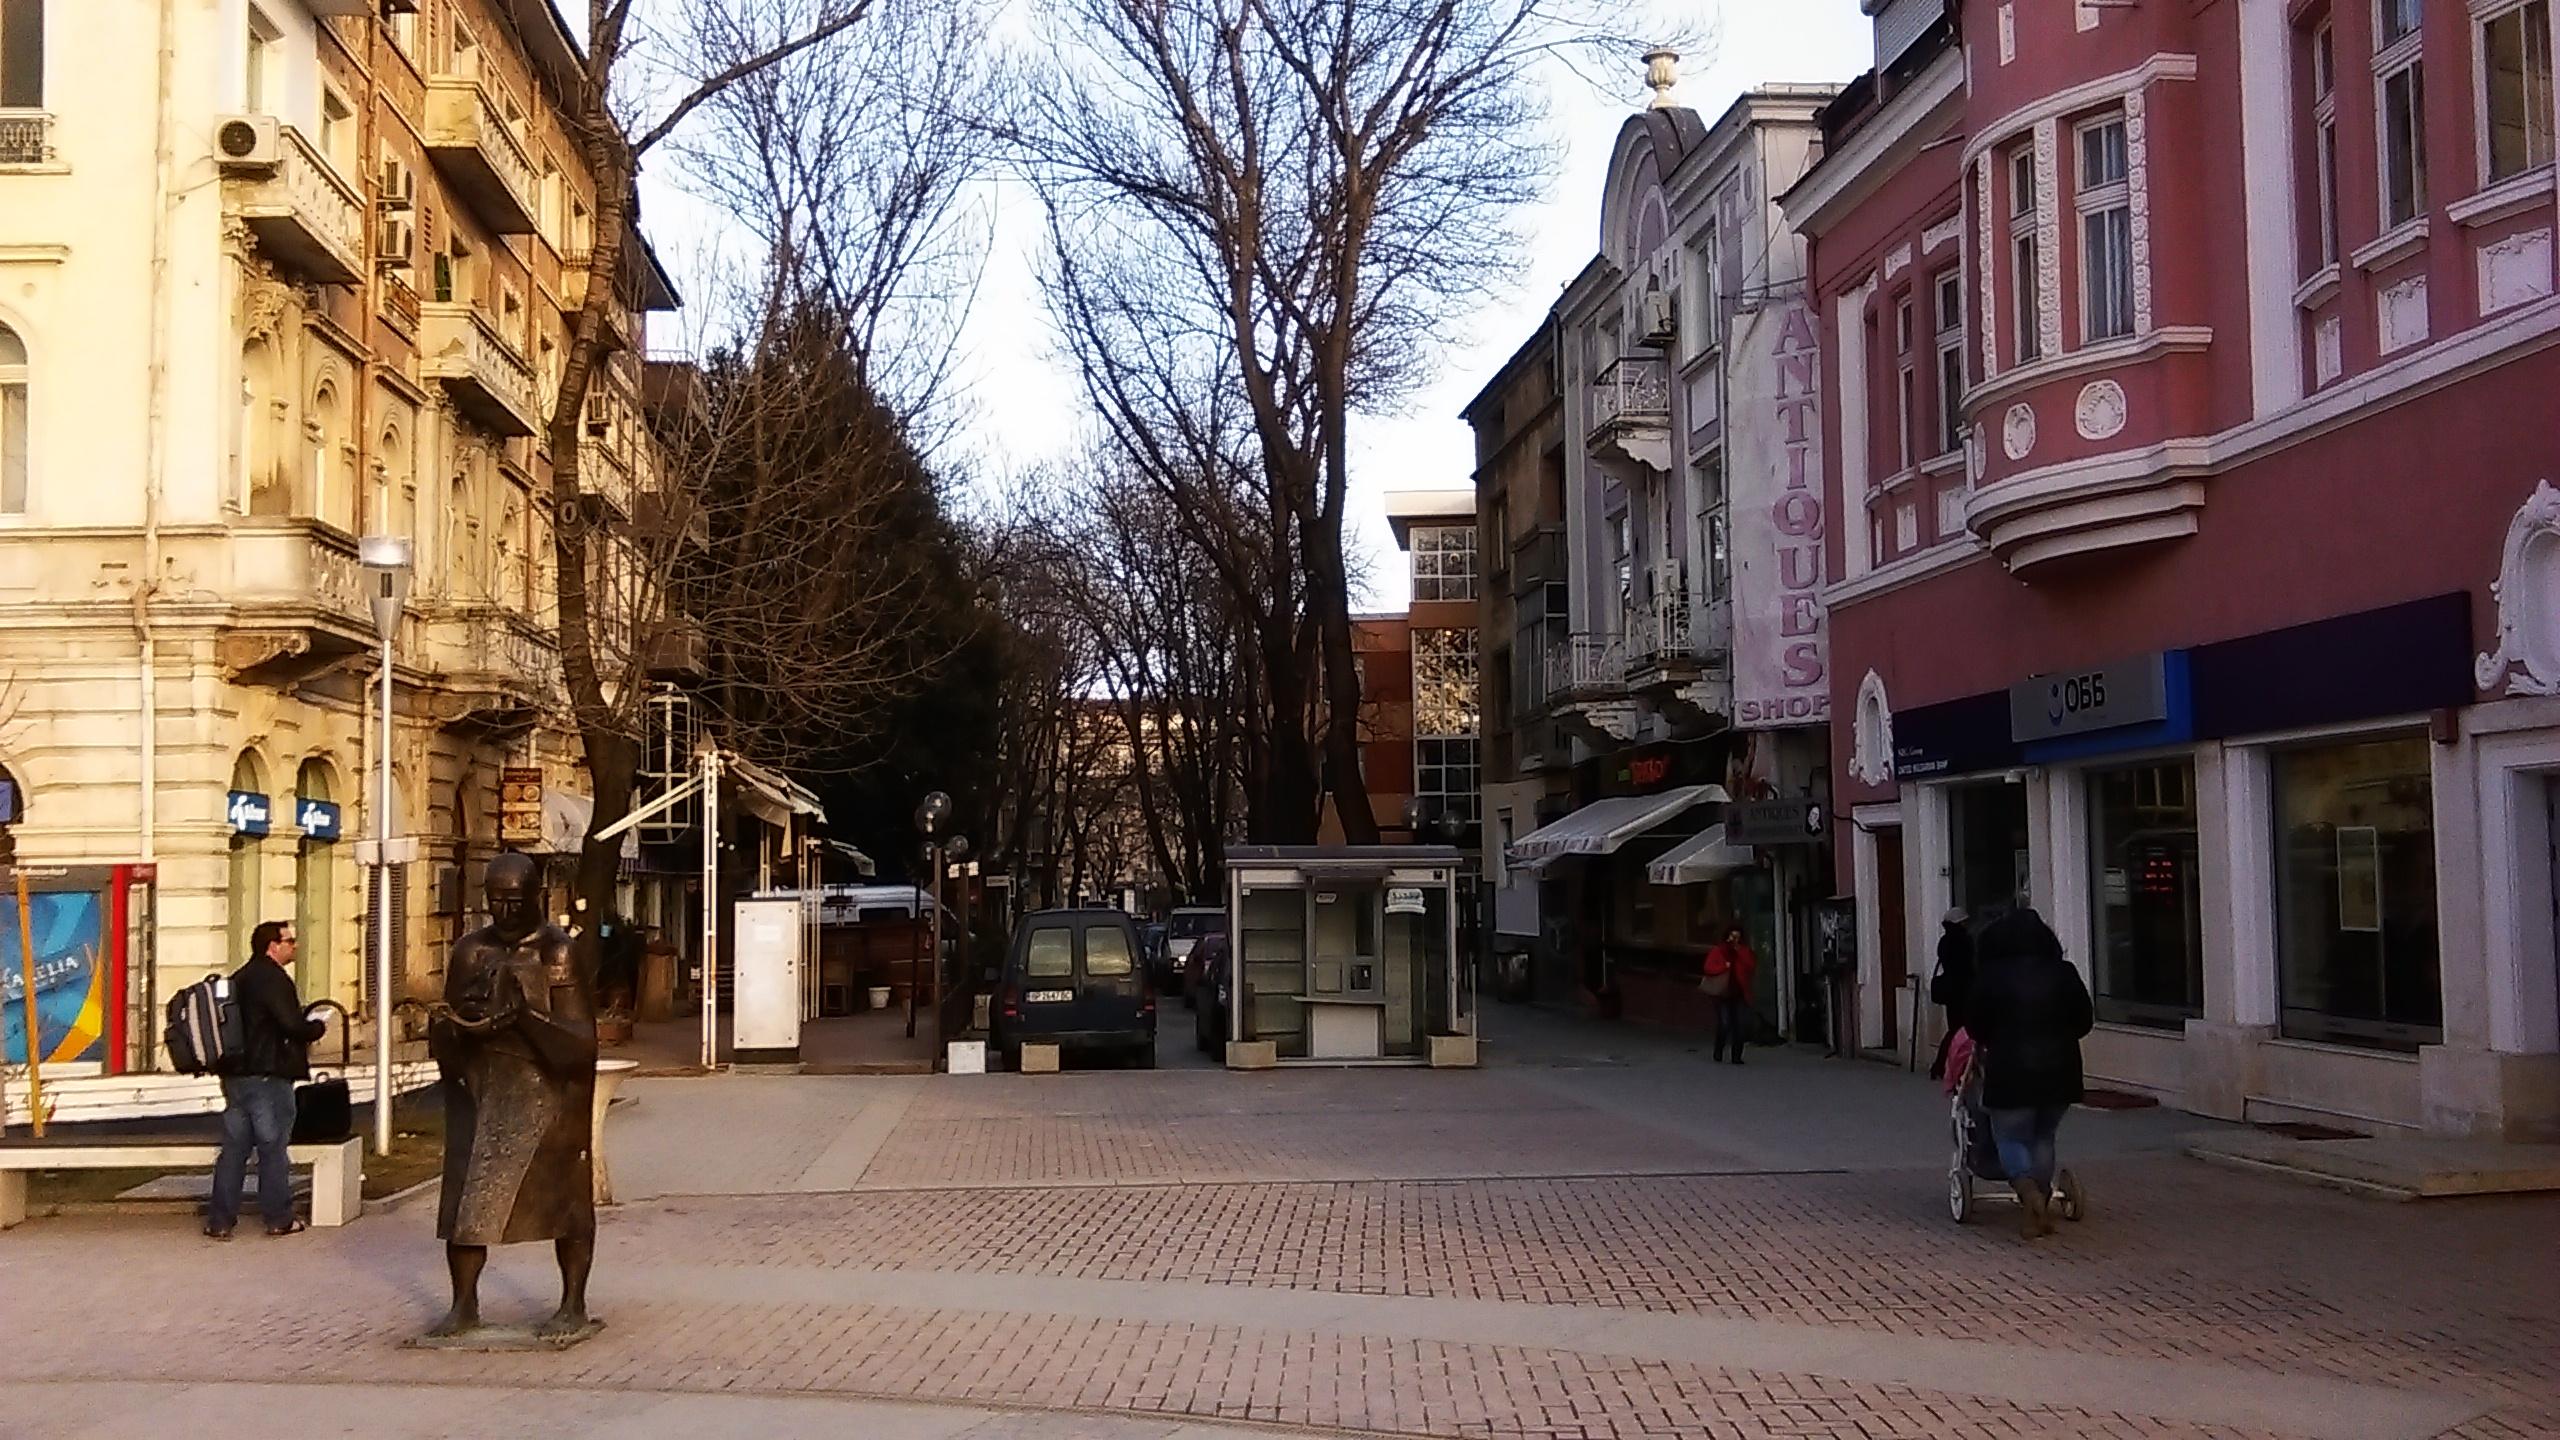 Mihail Koloni Ulica Vv Varna Uikipediya